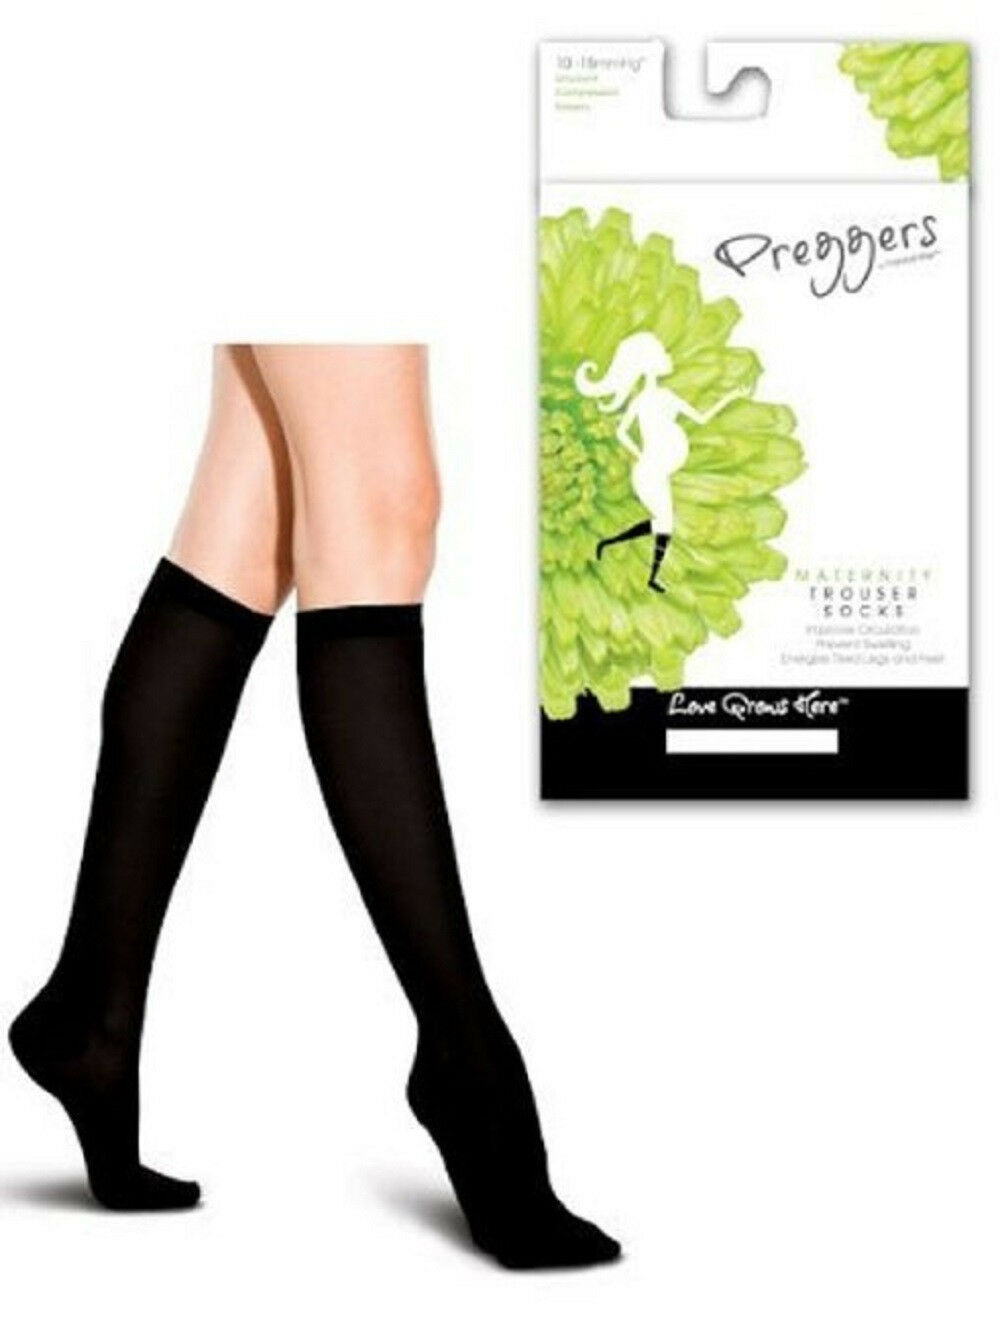 Preggers French Twist Maternity Support Trouser Socks 10-15 mmHg